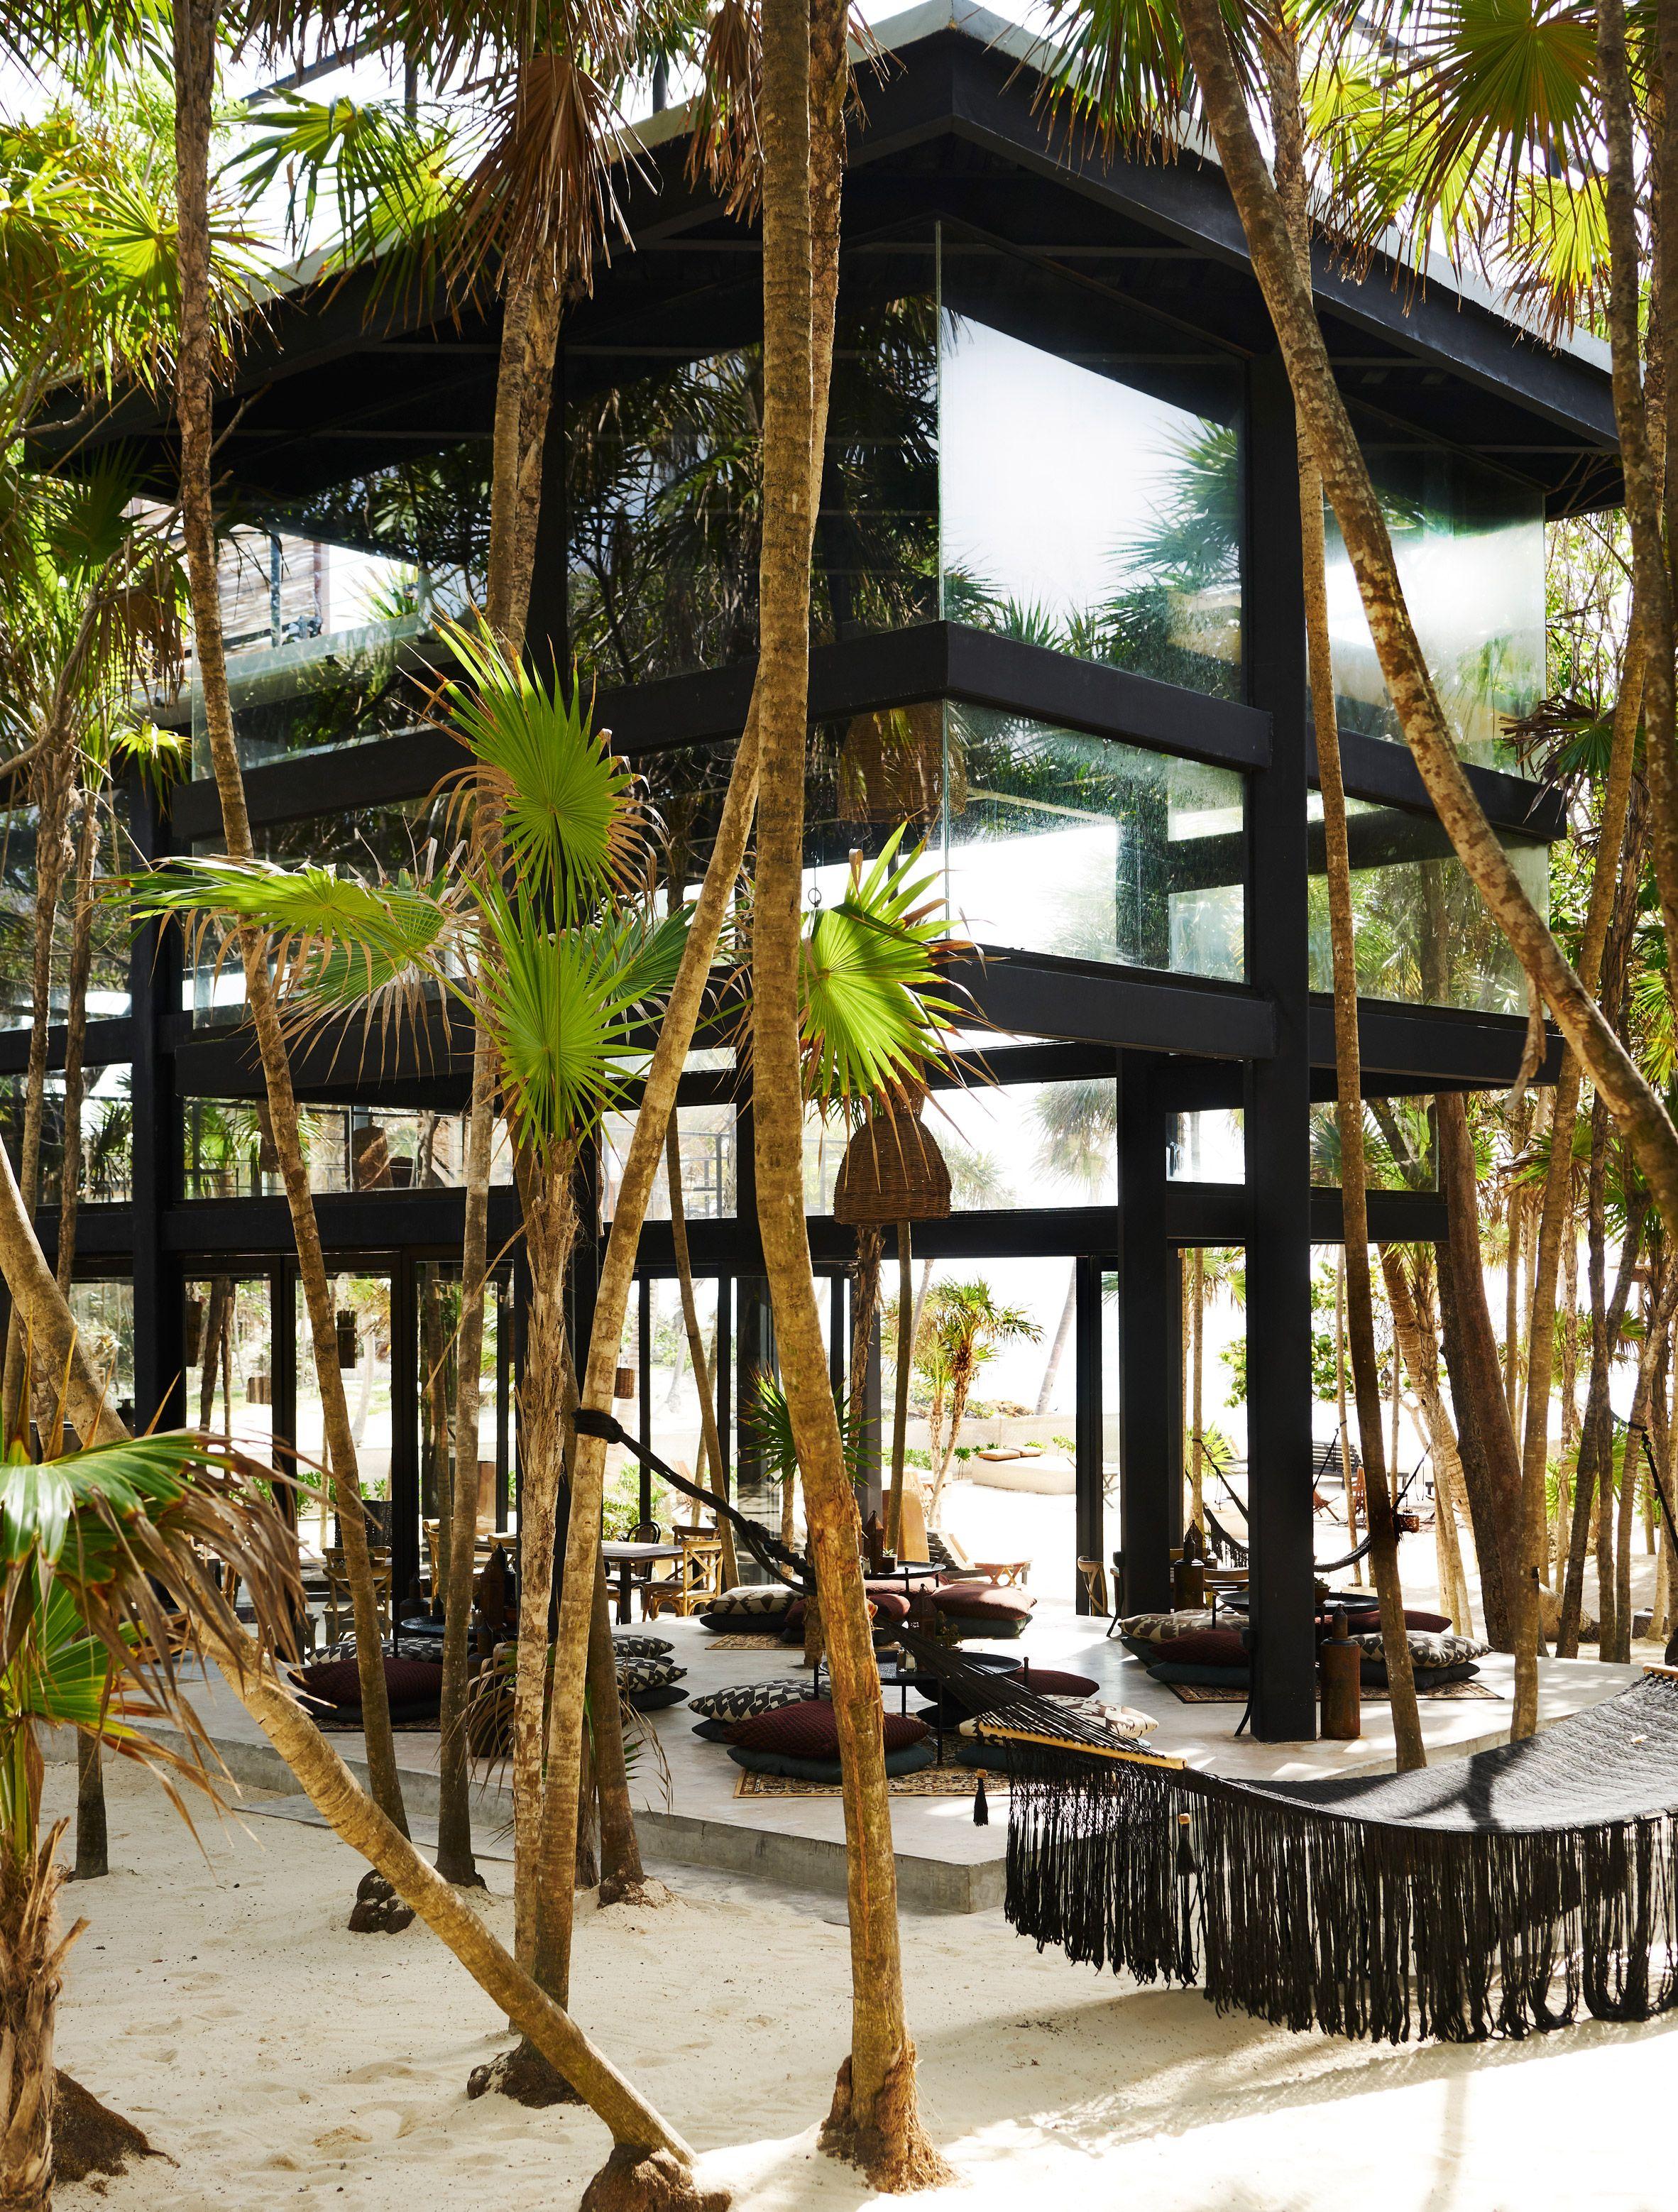 Habitas Tulum Boutique Hotel Offers Beachfront And Hidden Jungle